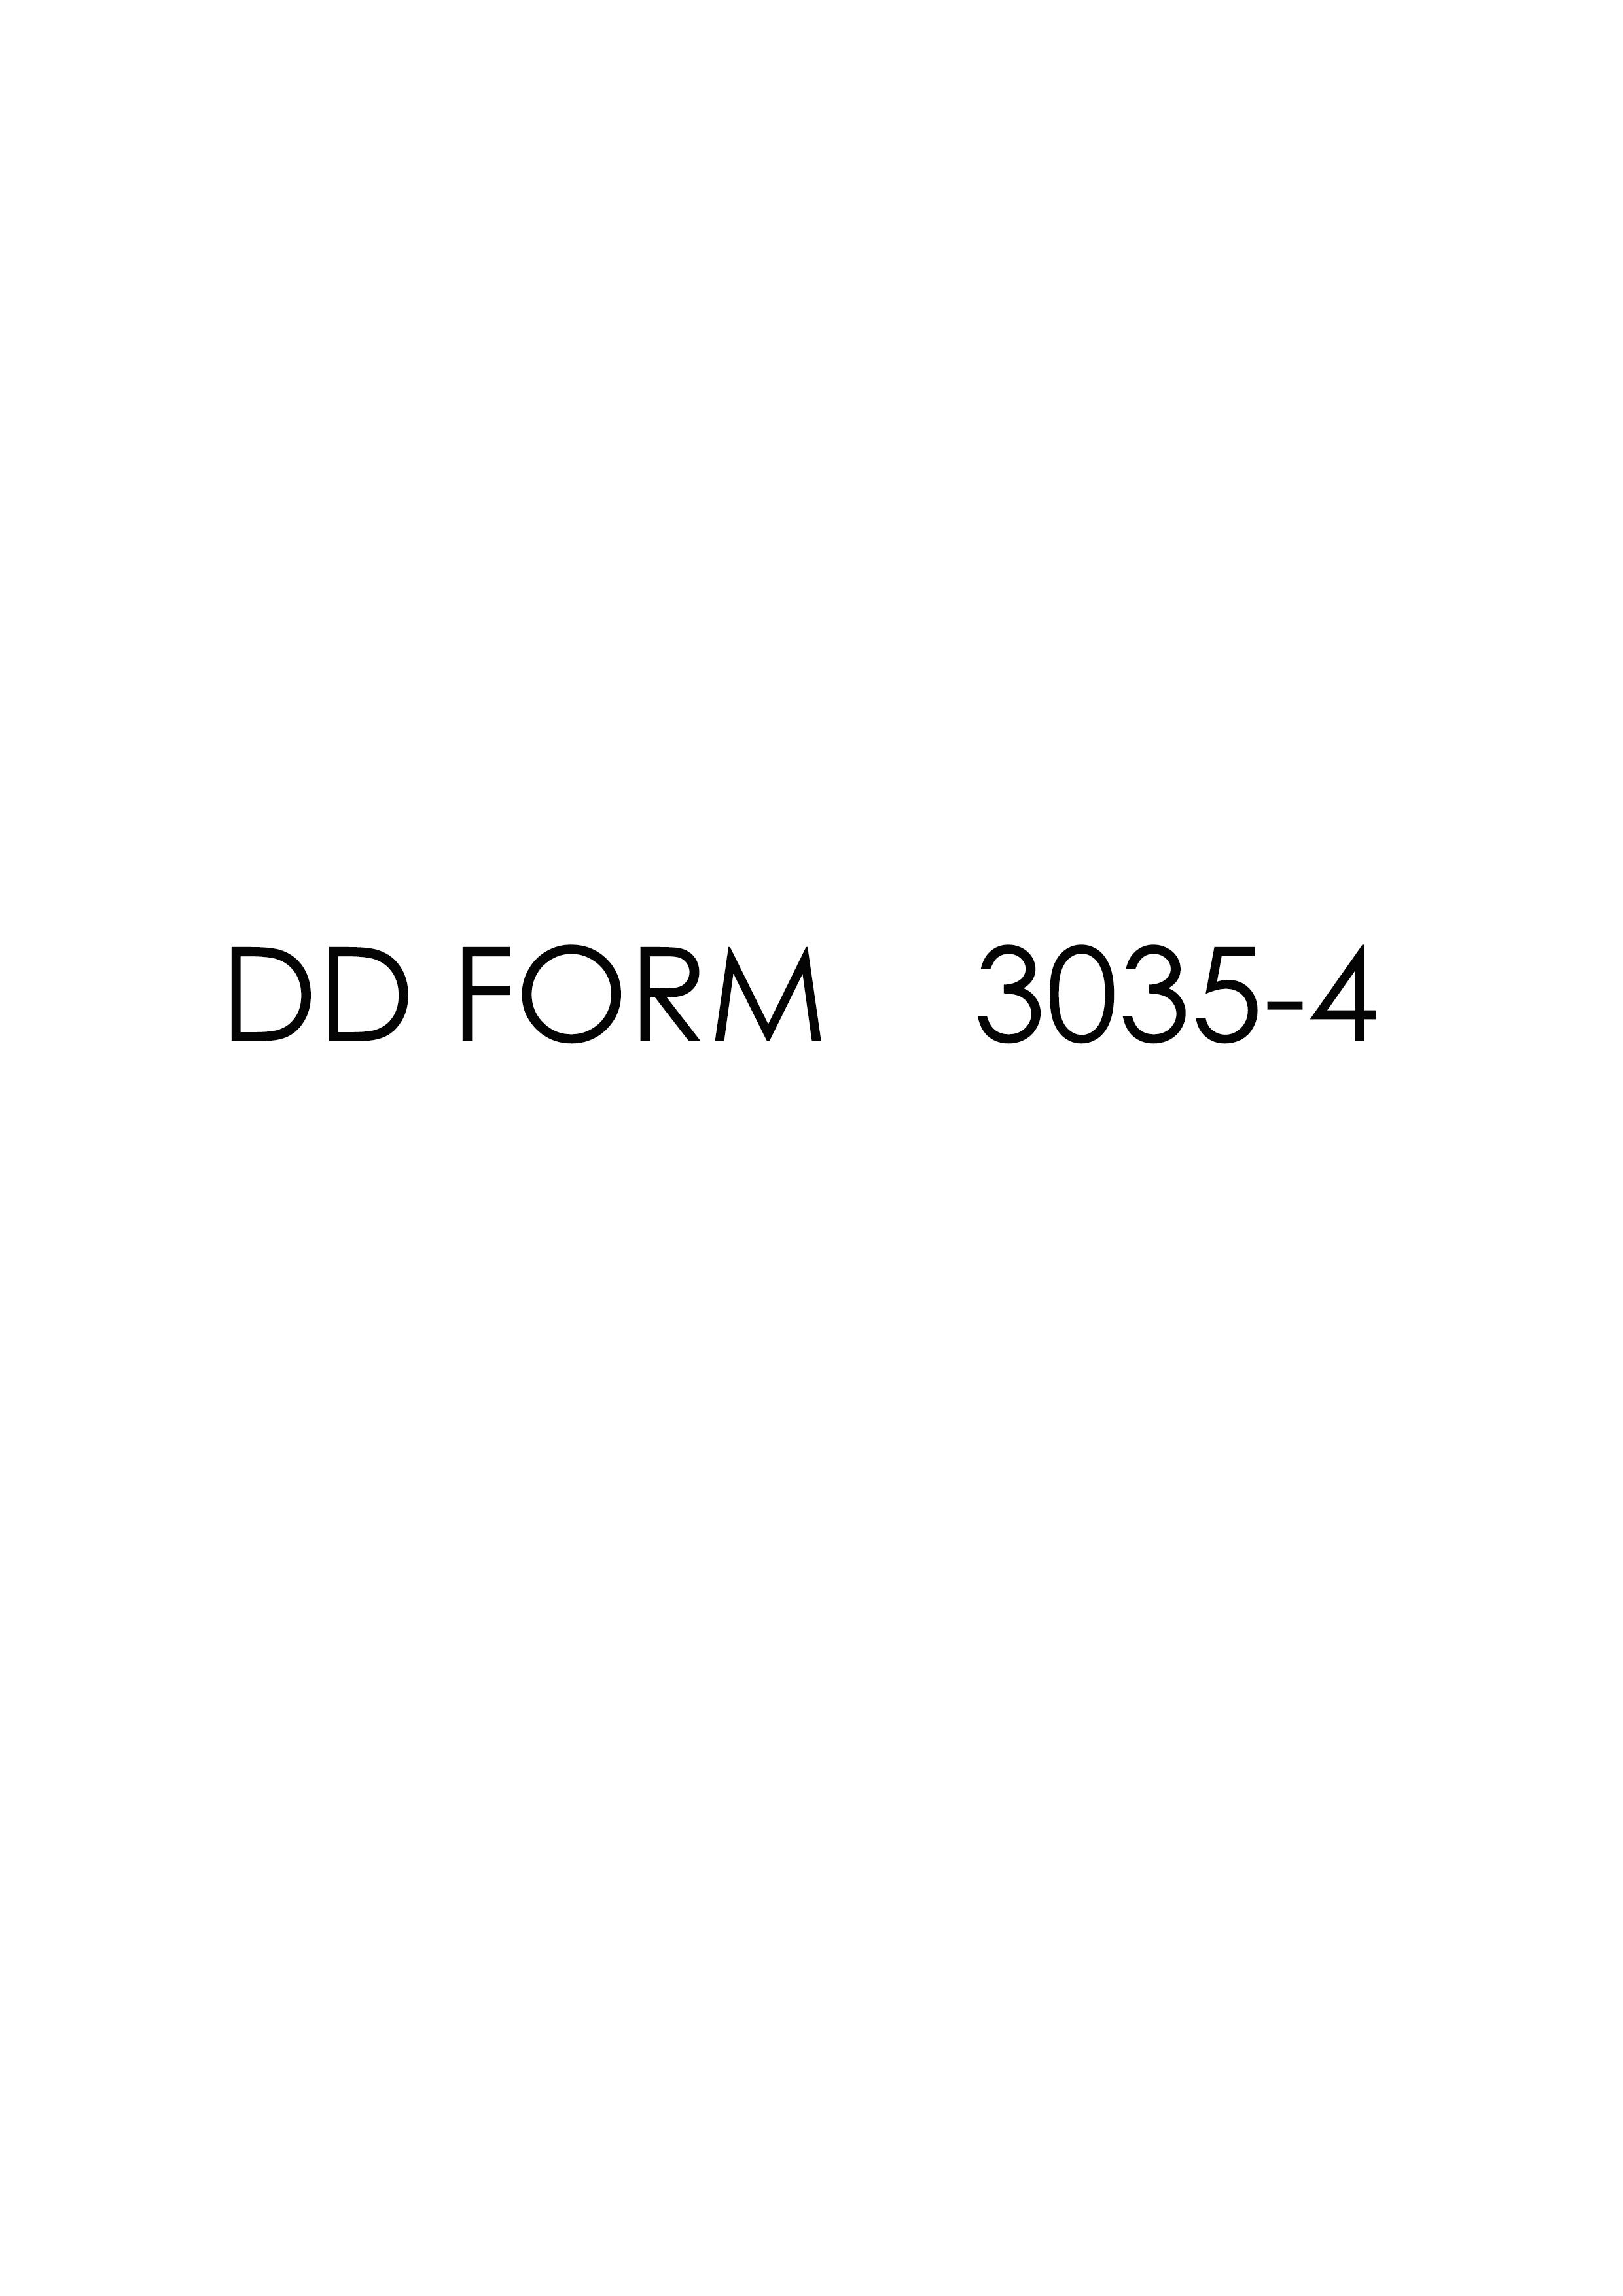 Download dd Form 3035-4 Free